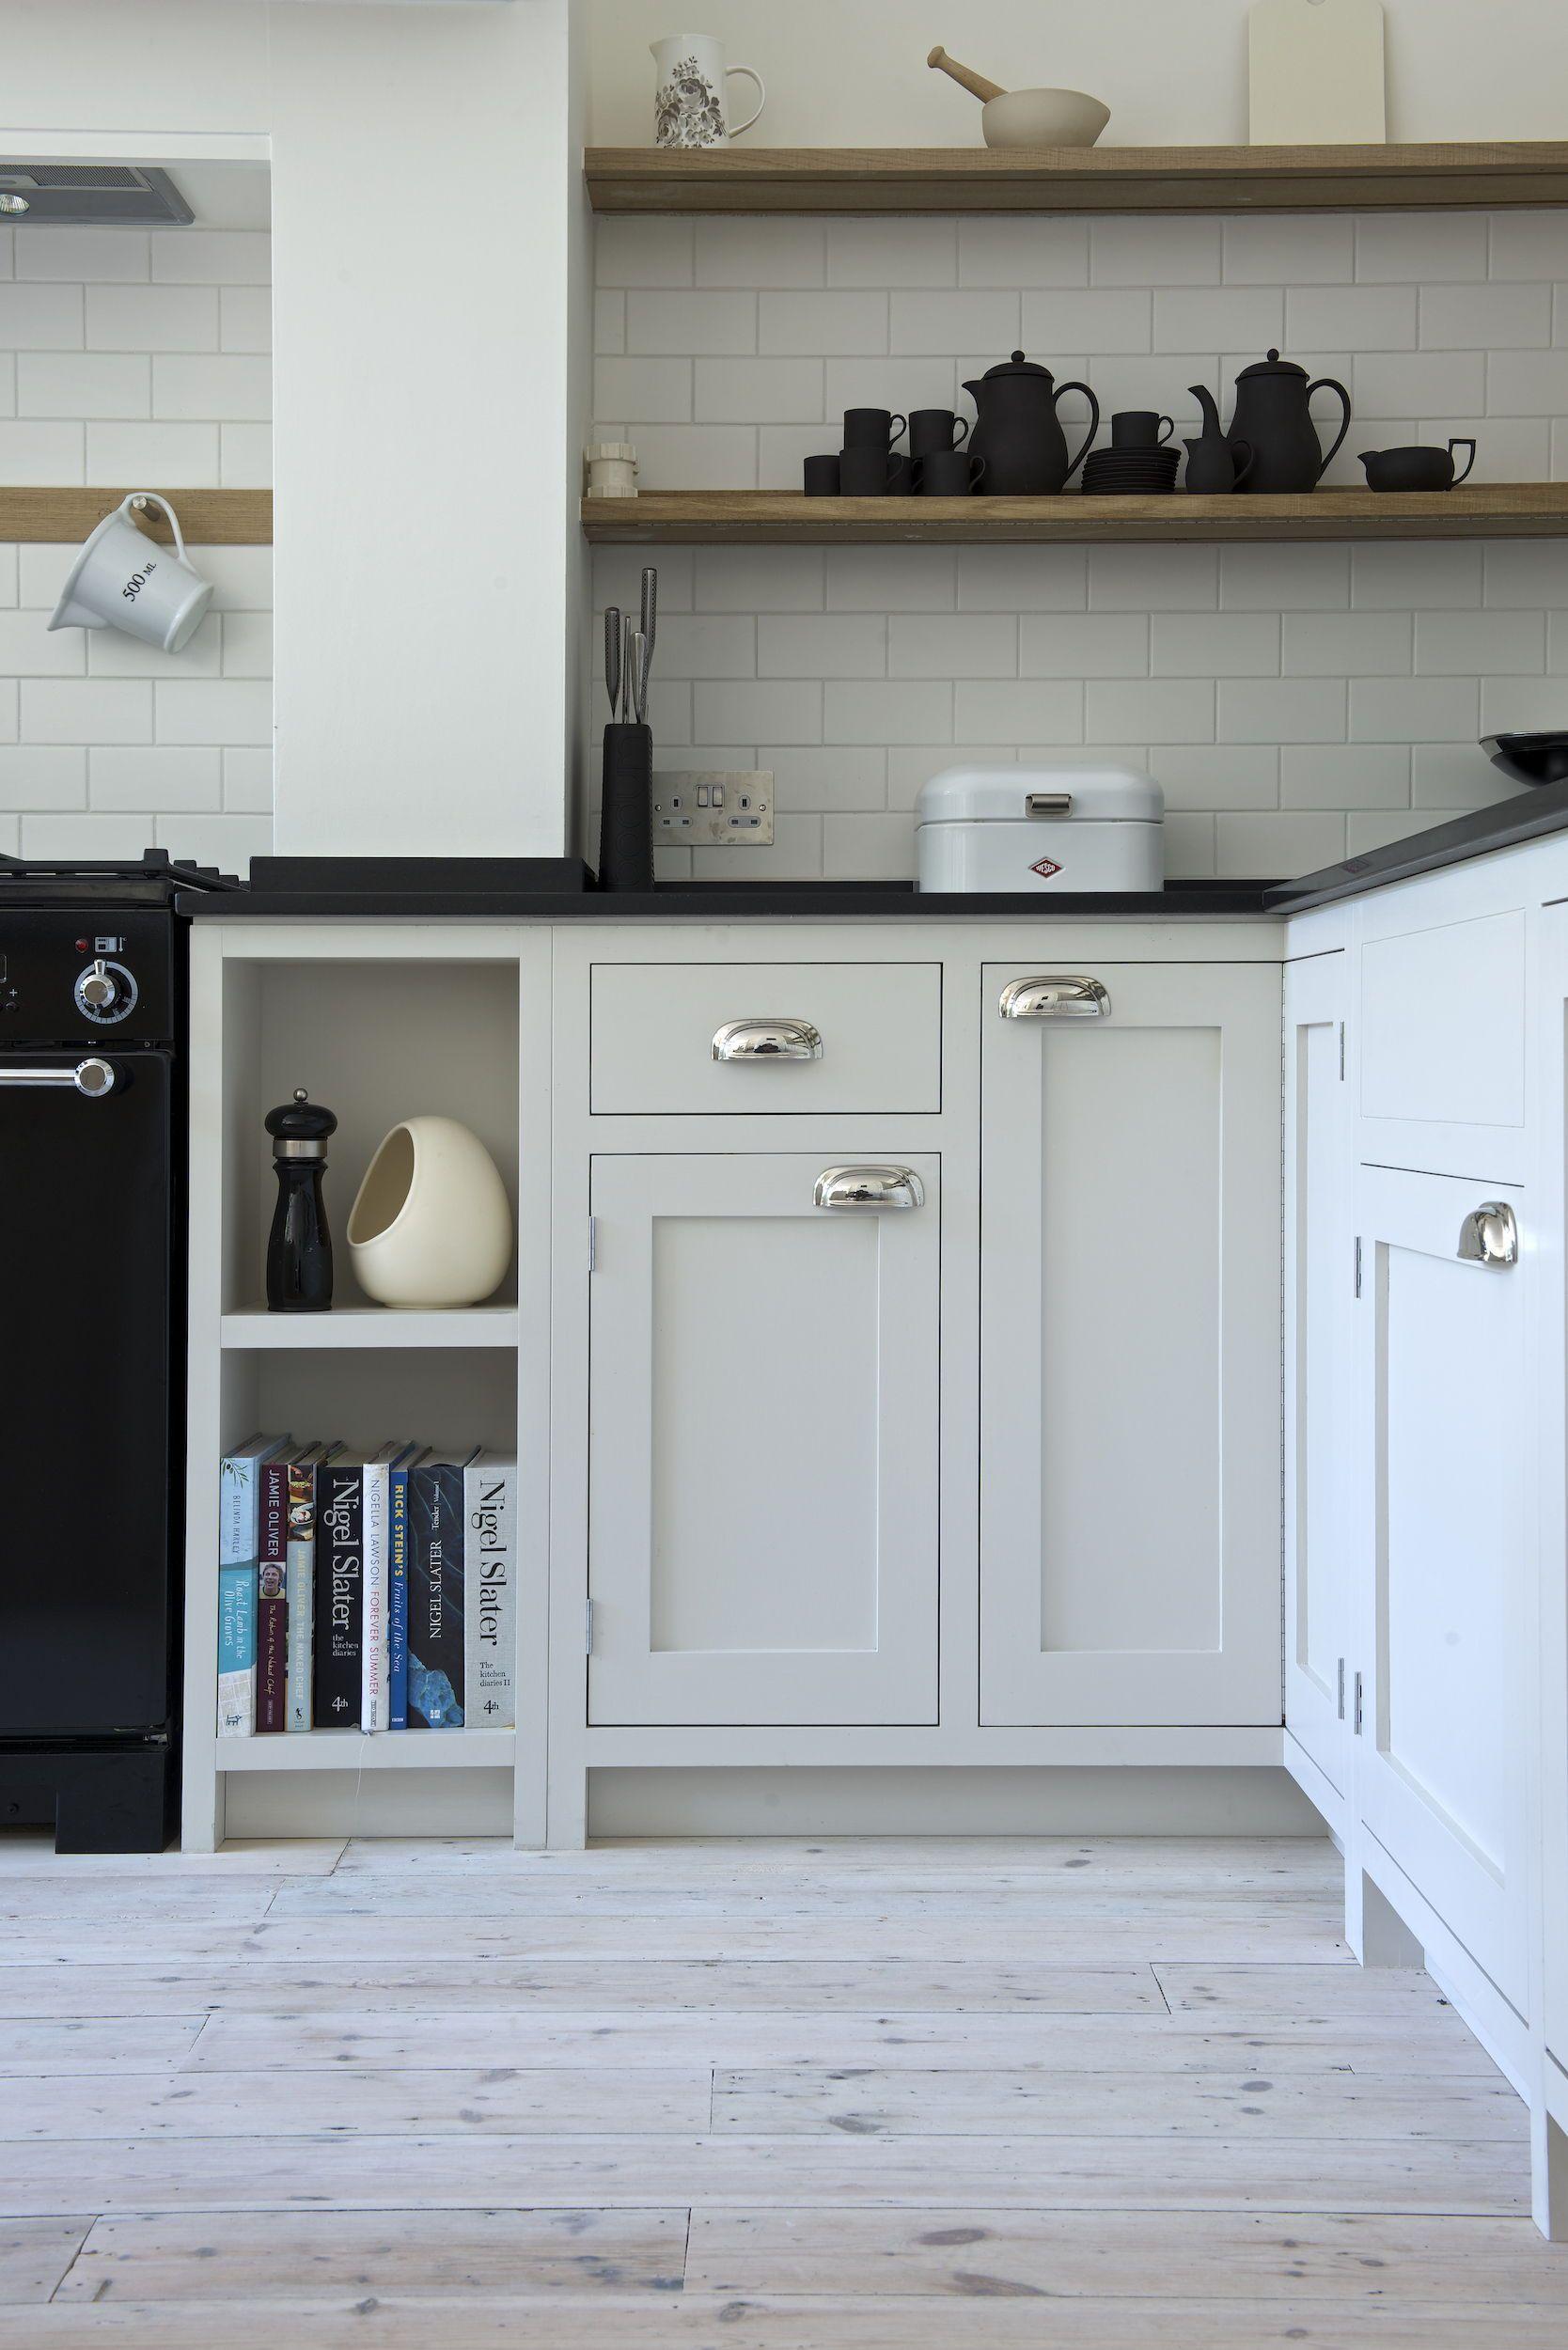 Georgian Kitchens: Get The Look: Materials